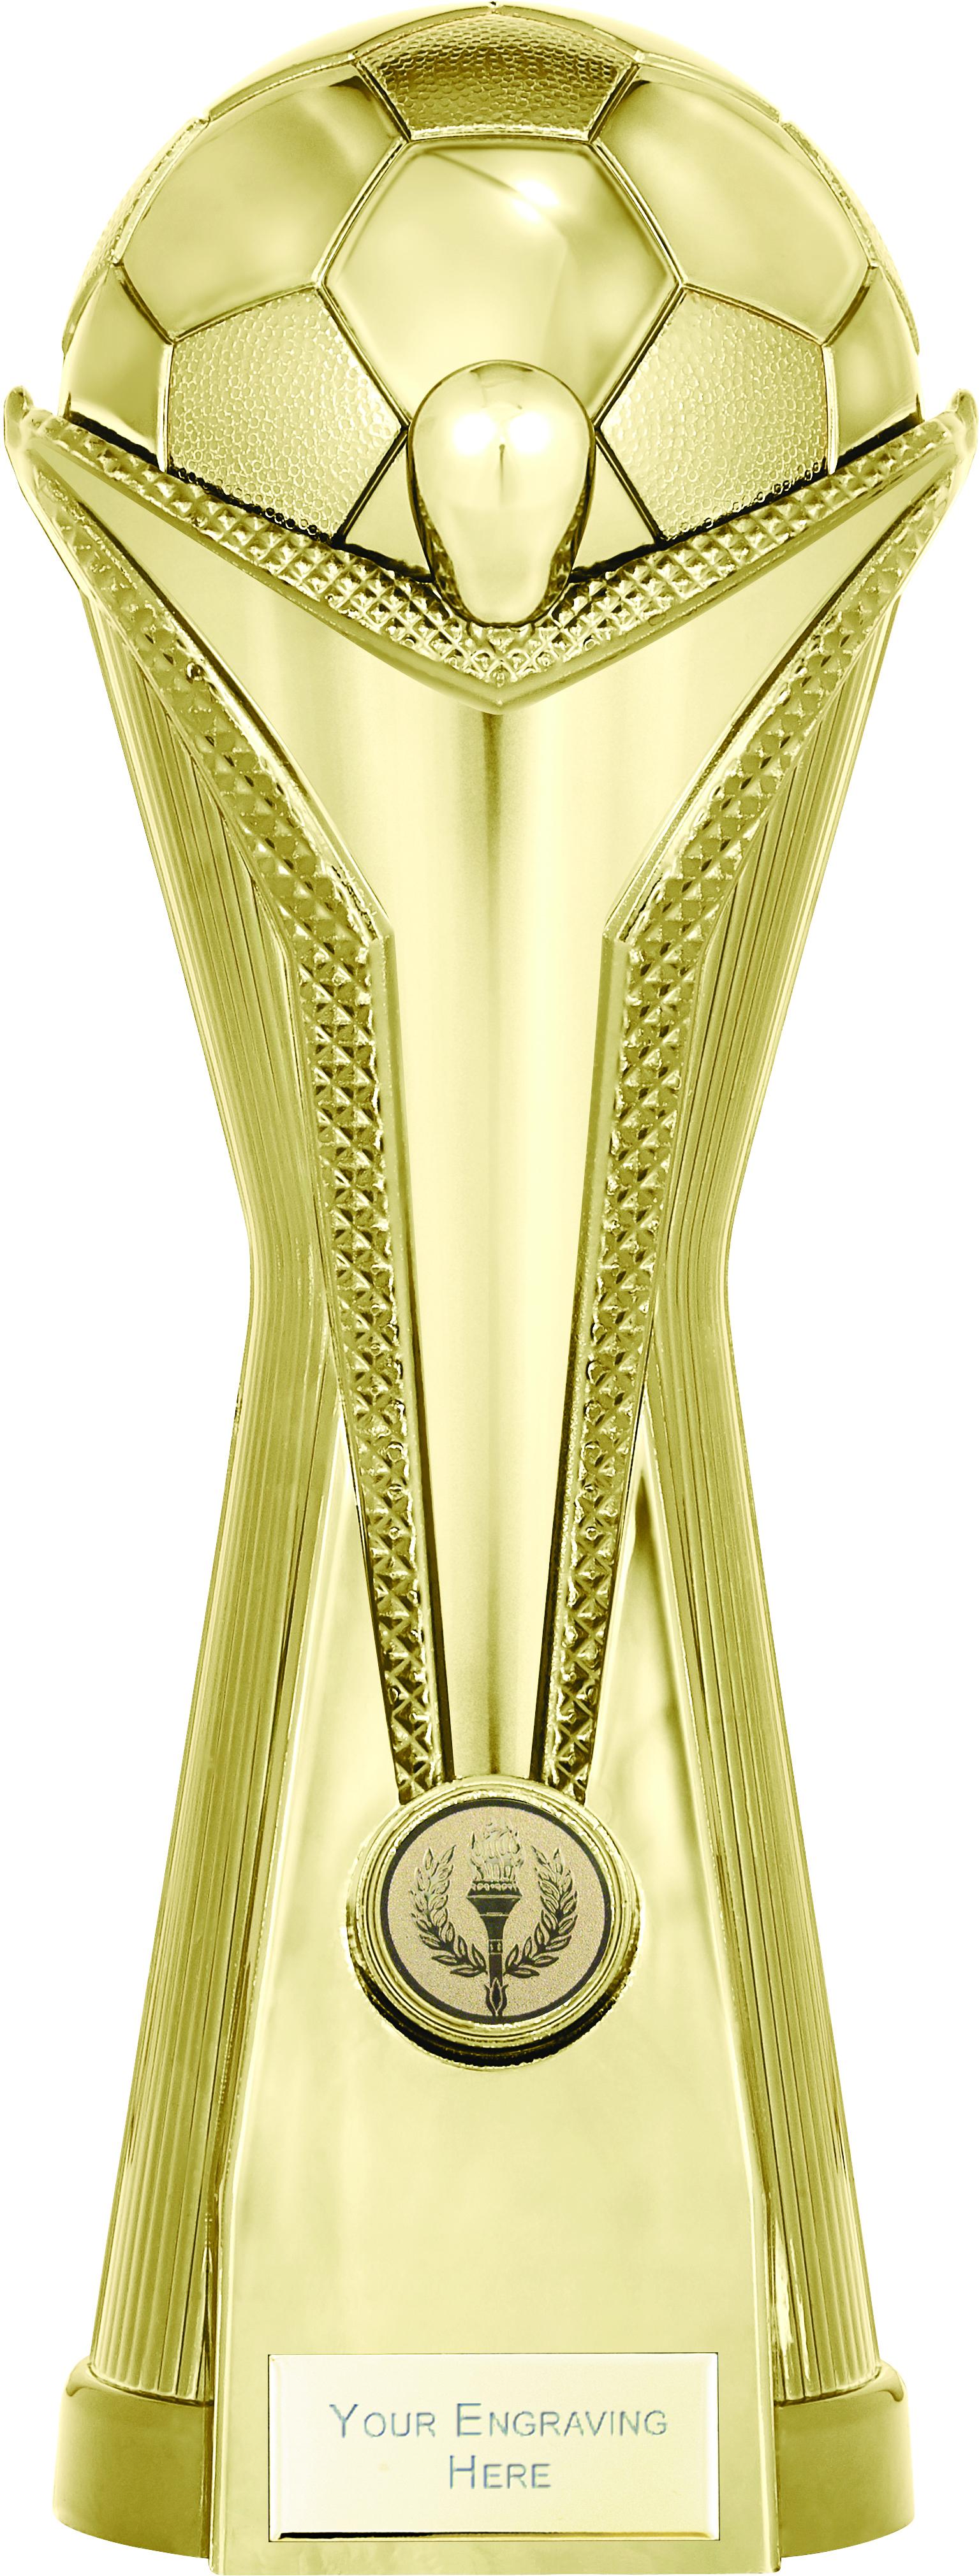 "World Football Cup Heavyweight Gold Trophy 30cm (11.75"")"